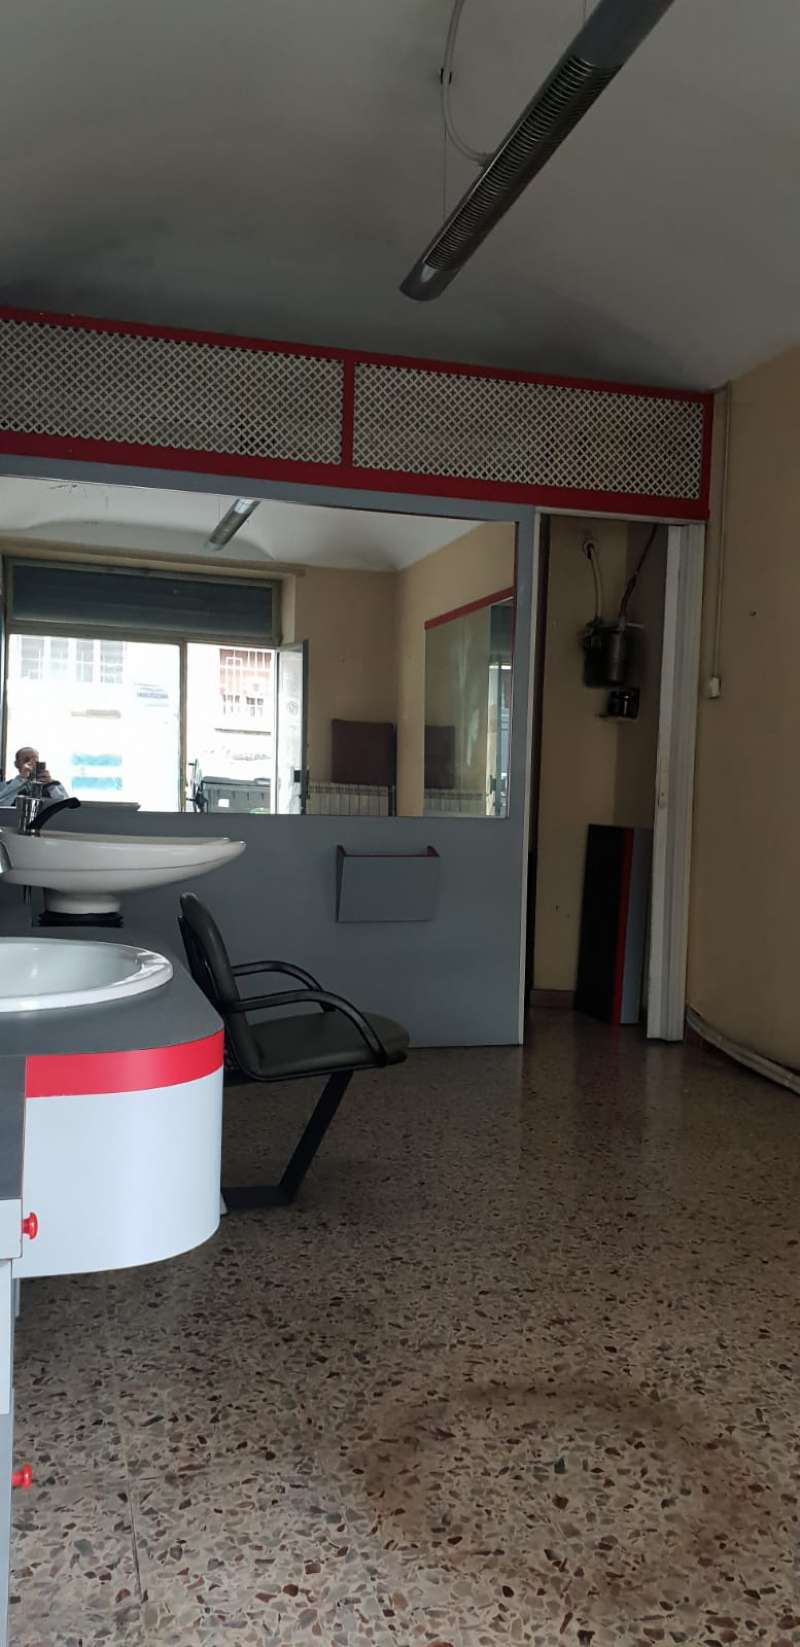 Negozio in vendita Zona Valdocco, Aurora - via Francesco Cigna 49 Torino